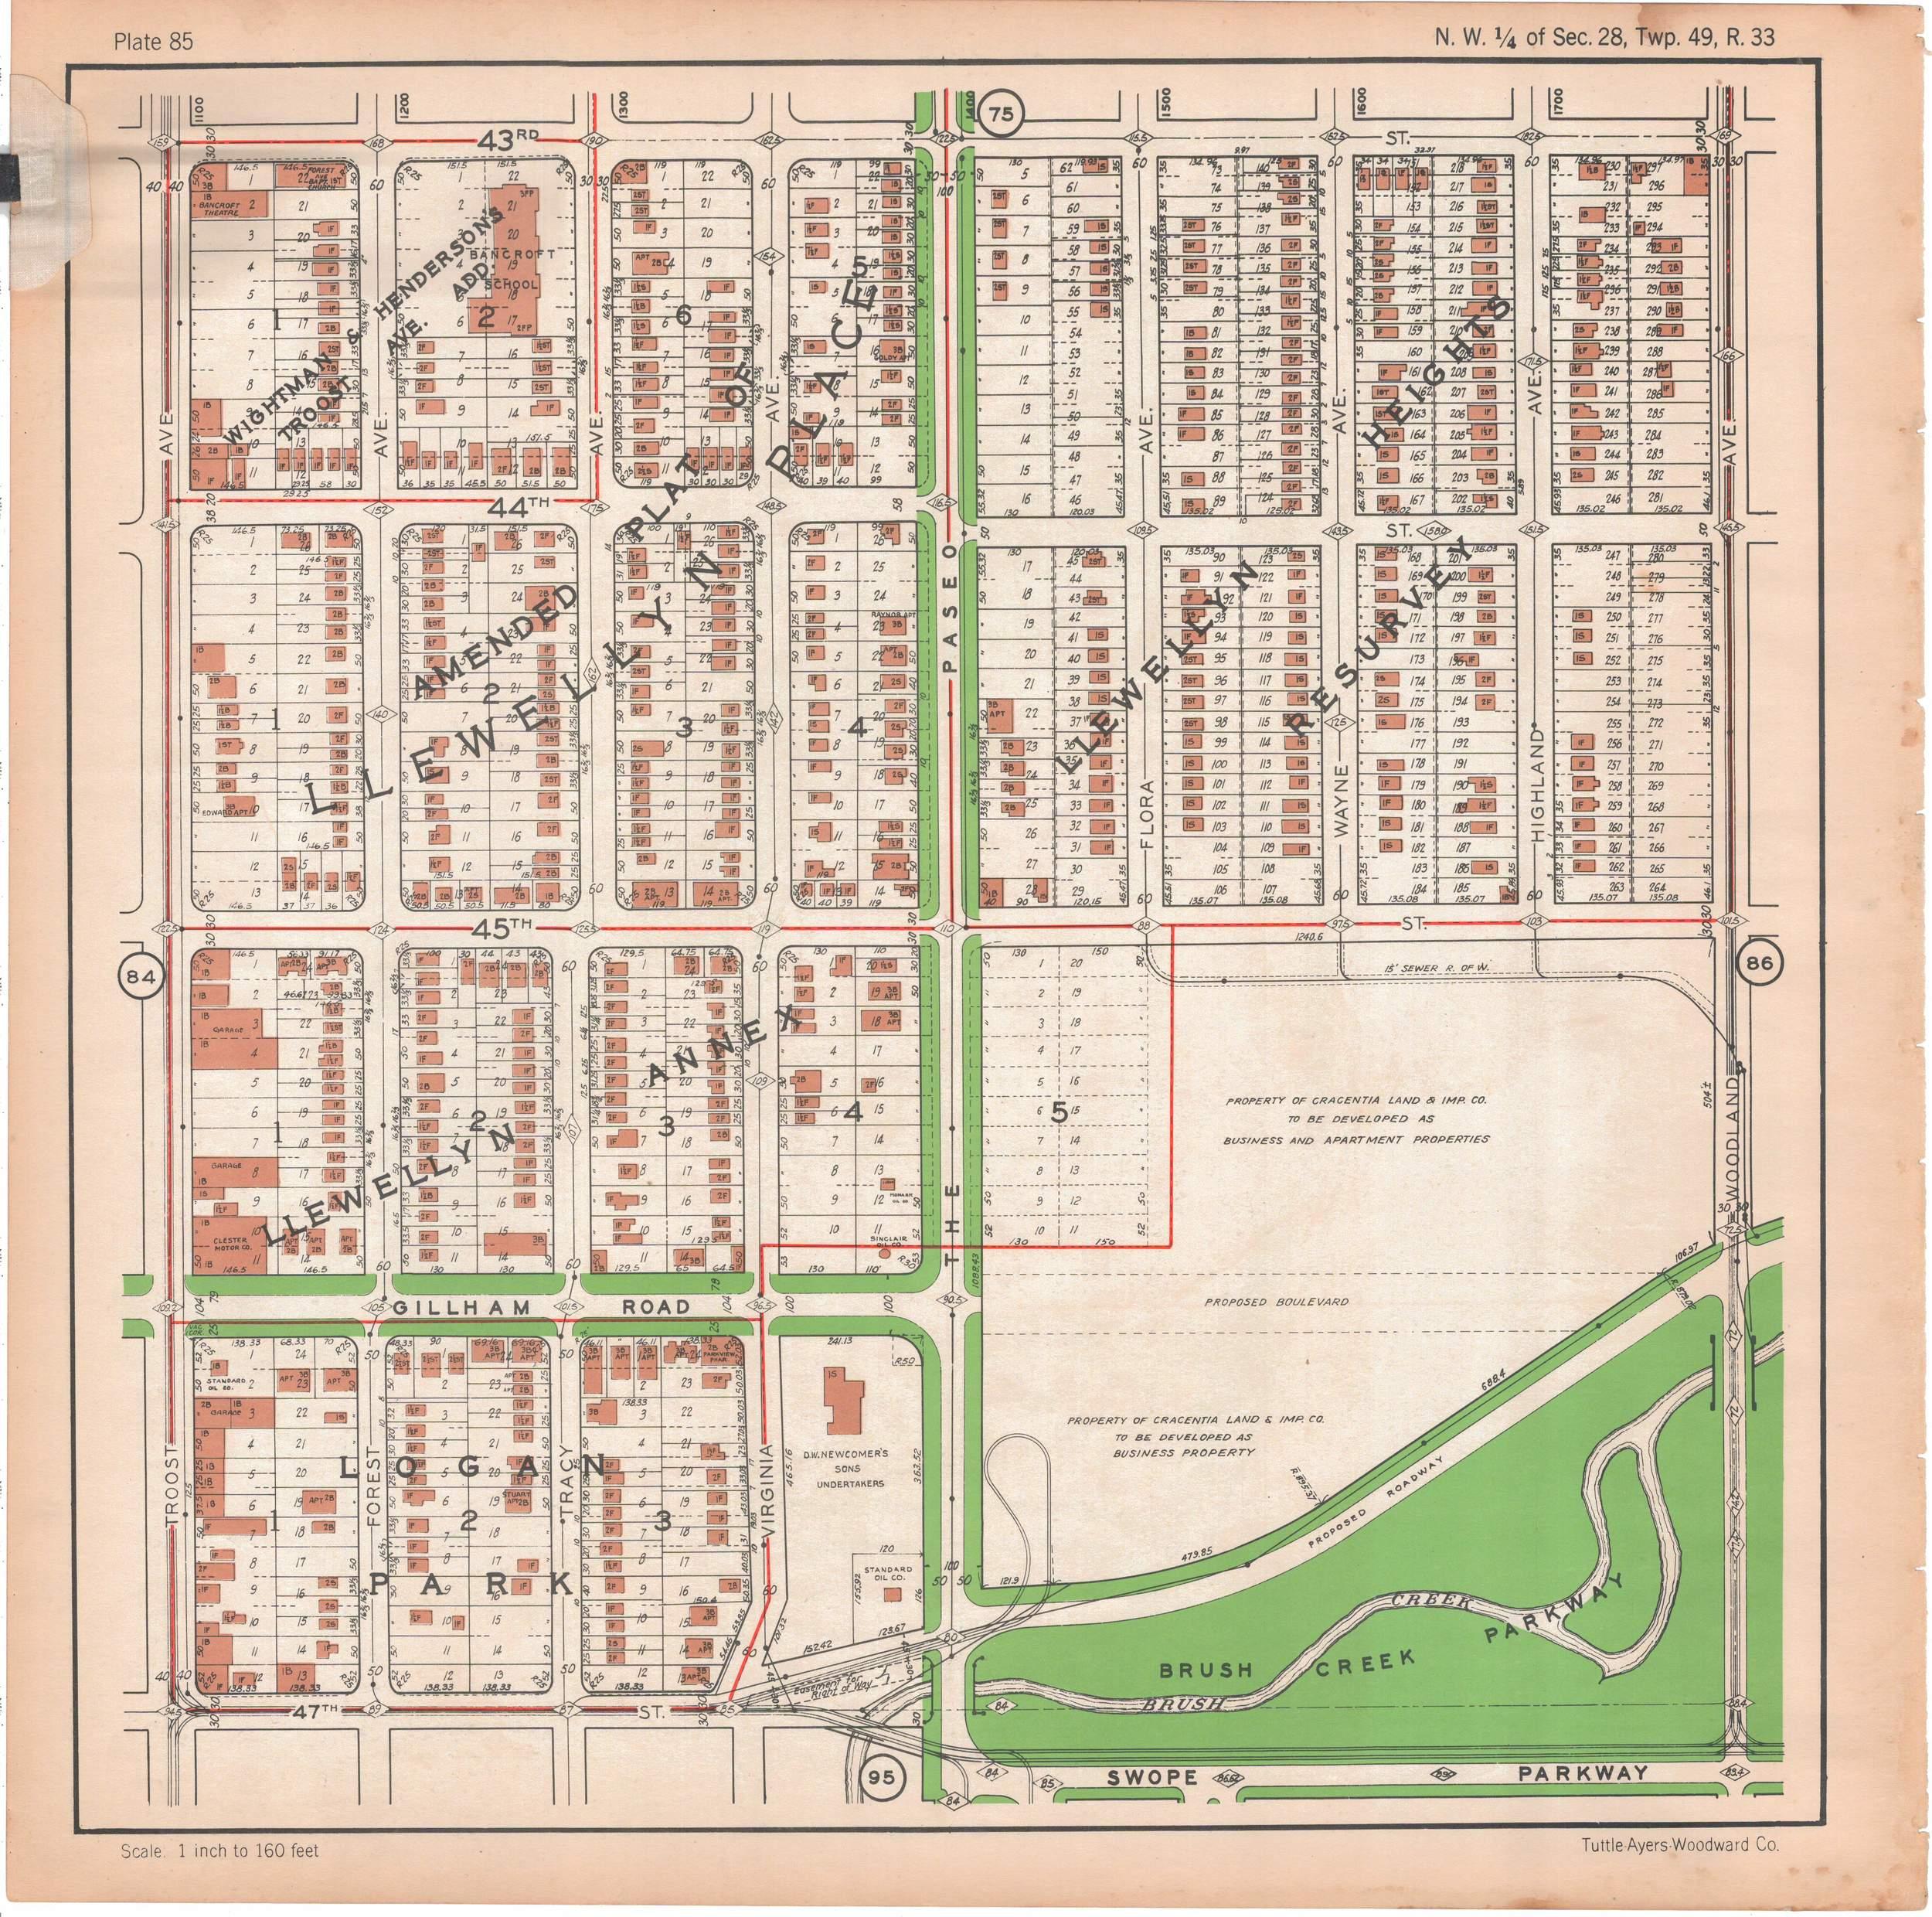 1925 TUTTLE_AYERS_Plate 85.JPG